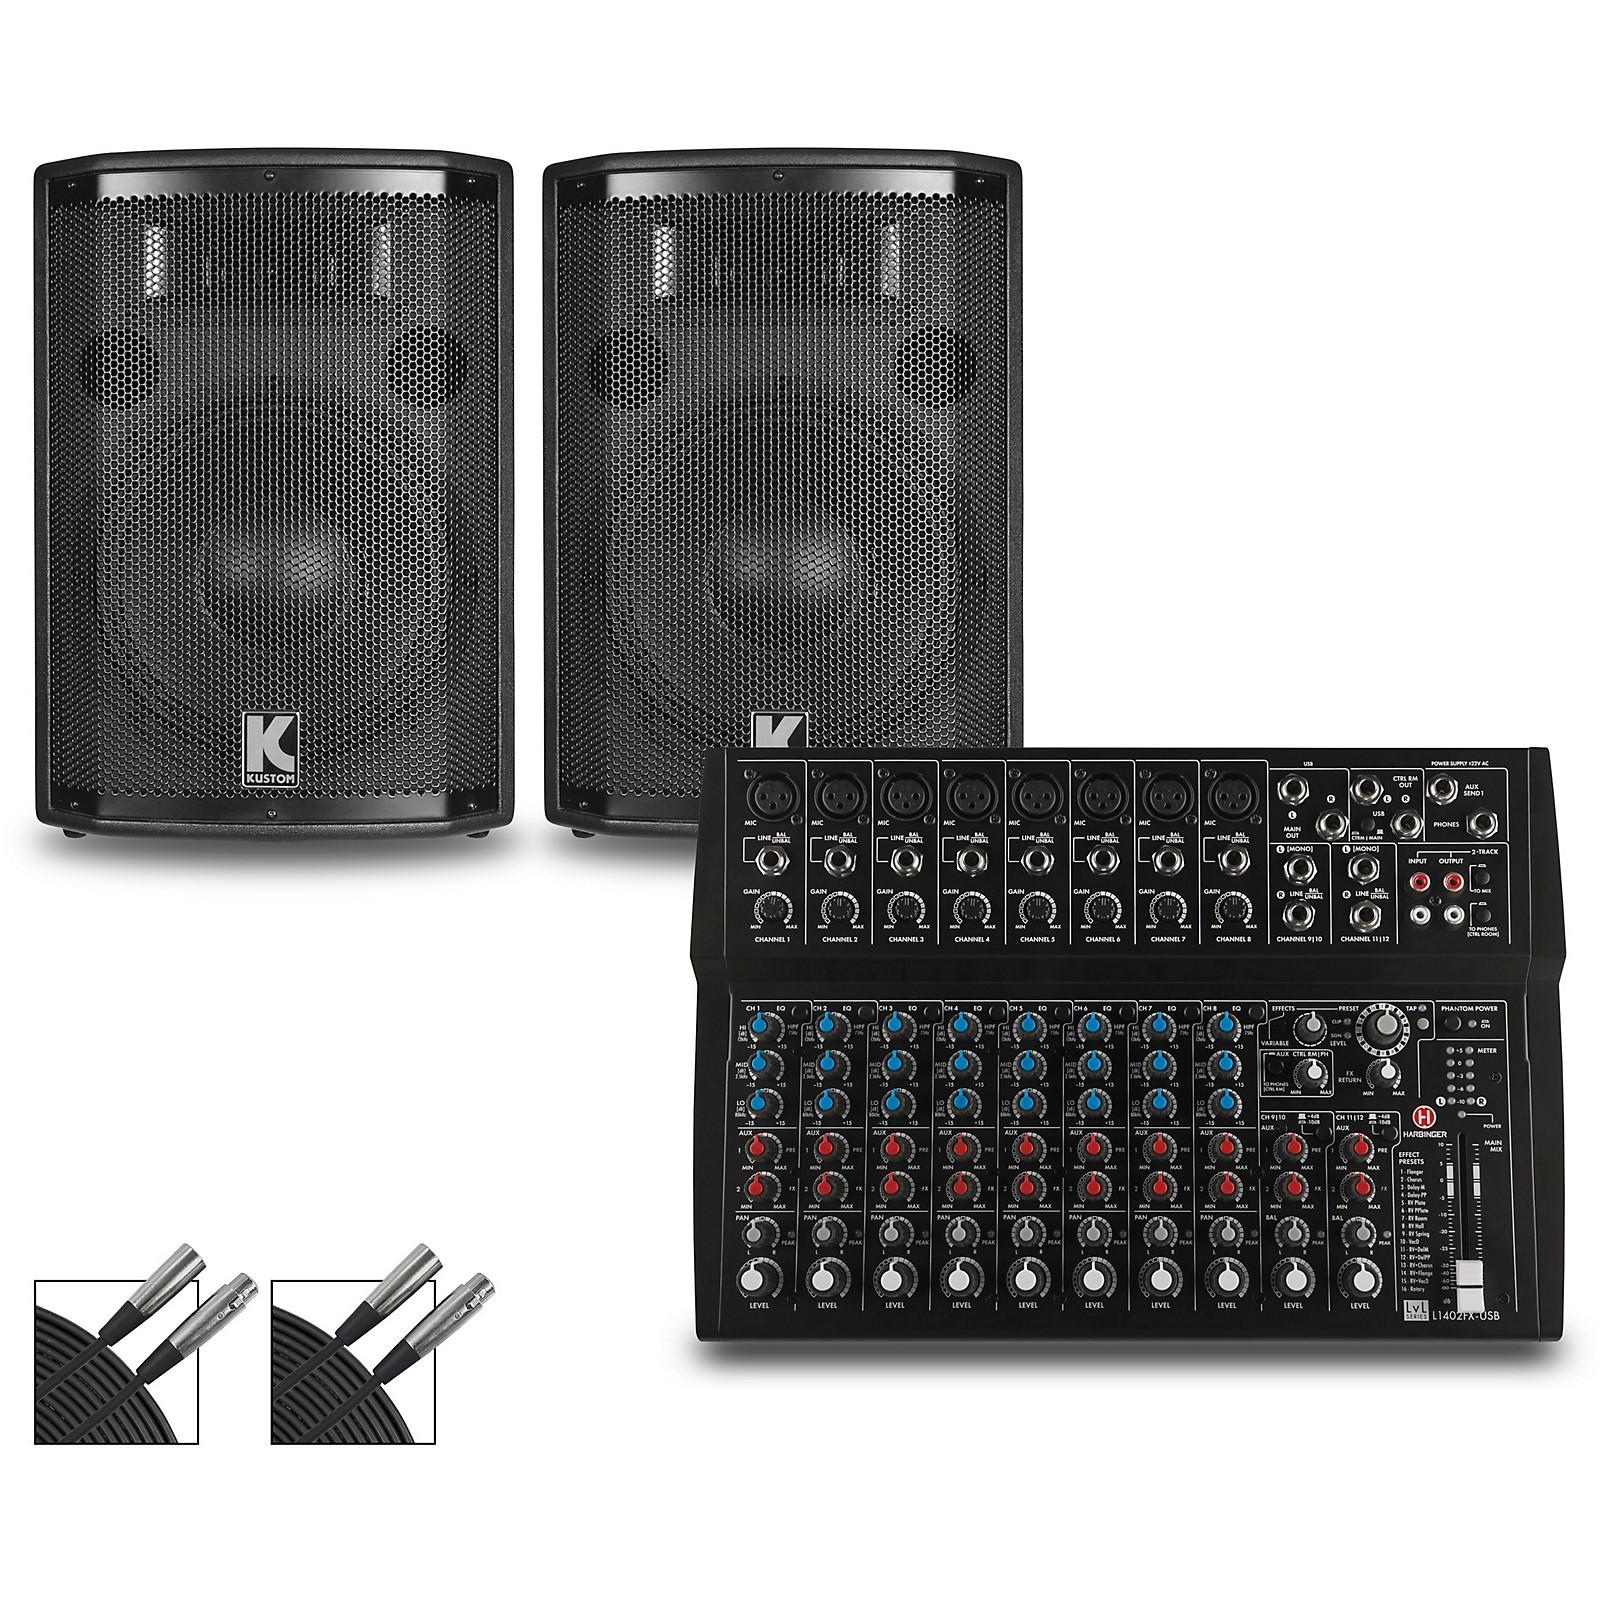 Harbinger L1402FX Mixer and Kustom HiPAC Speakers